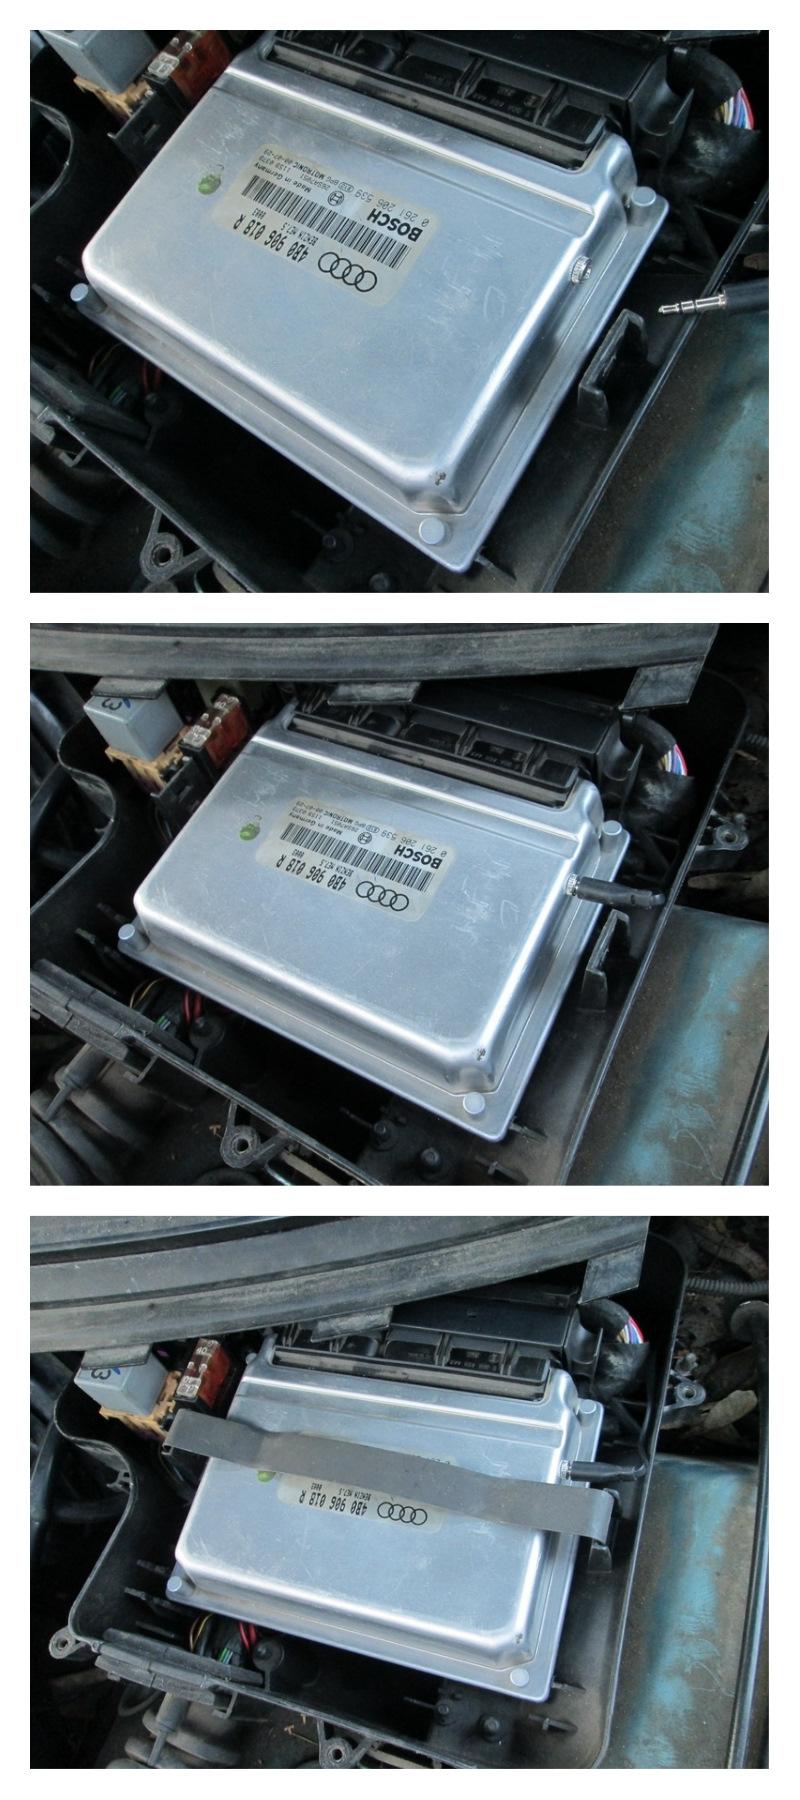 Установка двух прошивочного блока МЕ7.5 на машину